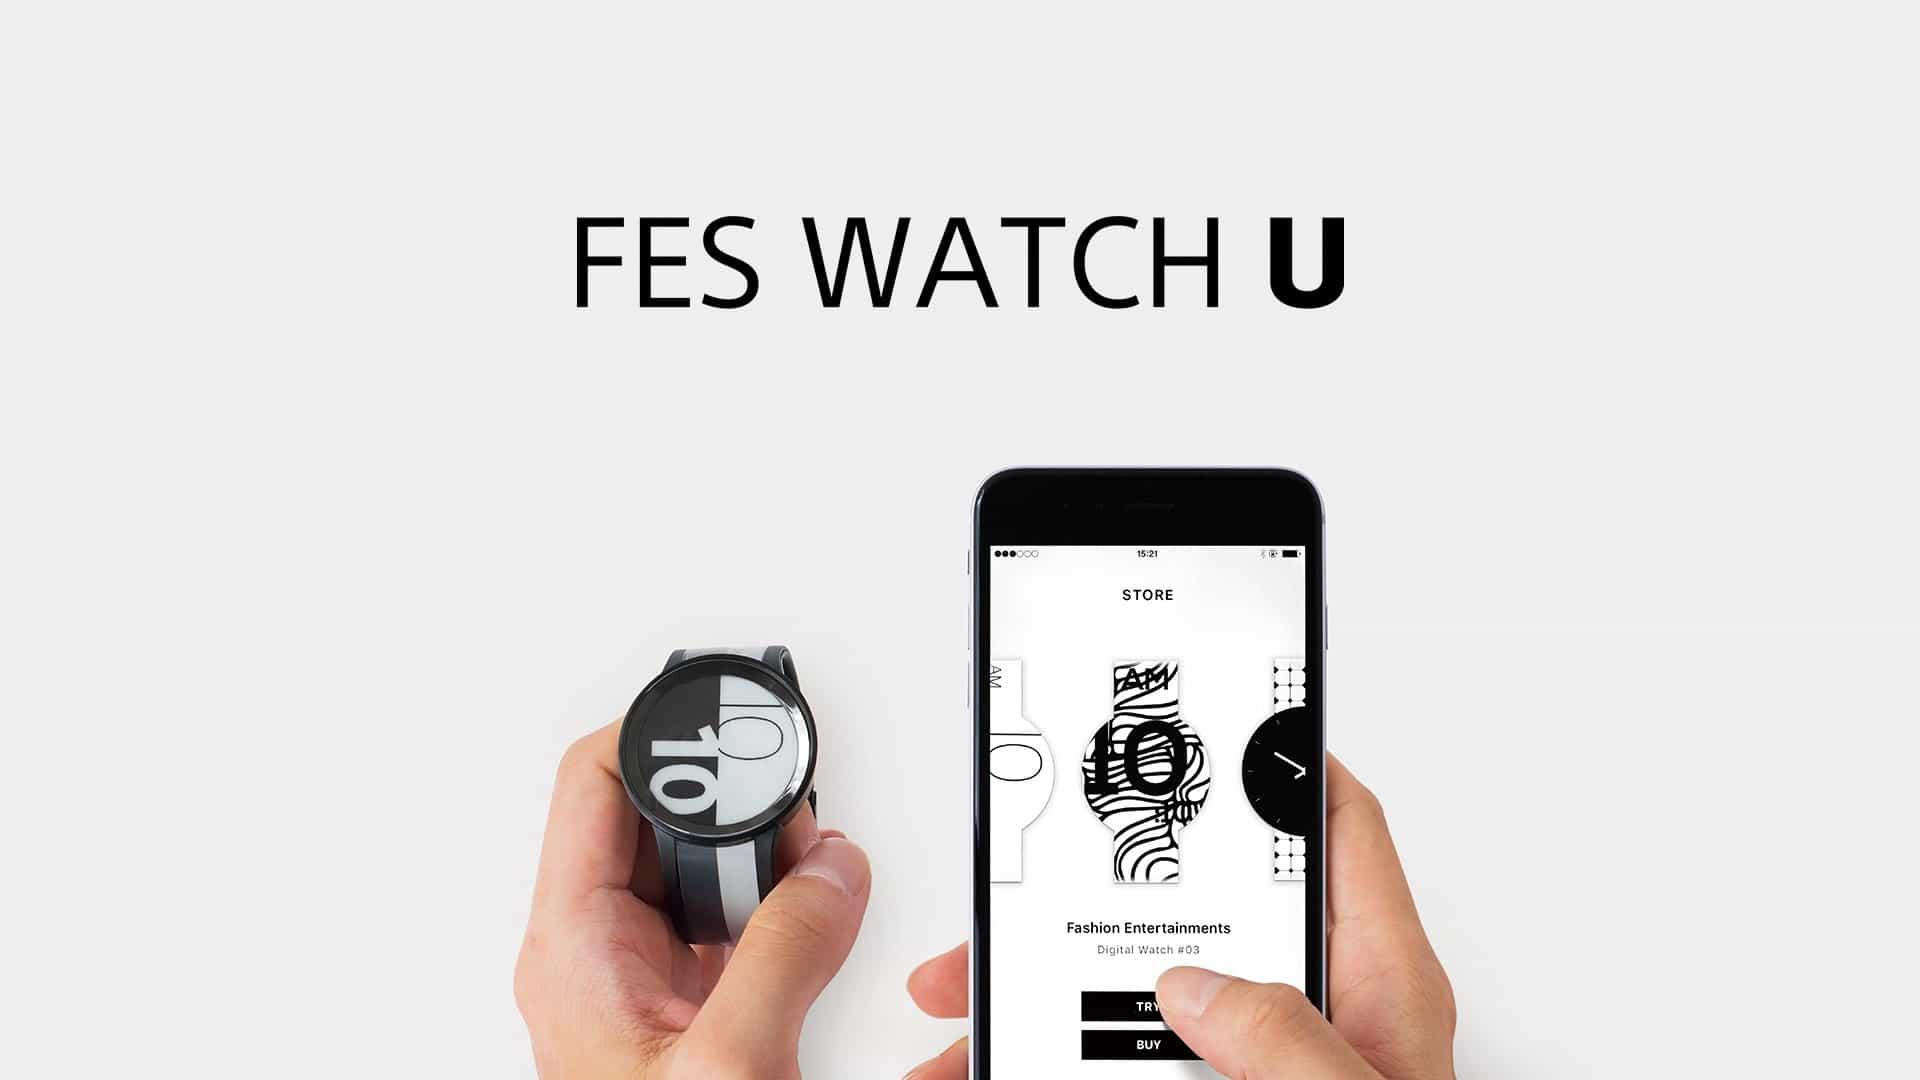 Sony FES Watch U, E Ink ekranlı kol saati çıktı